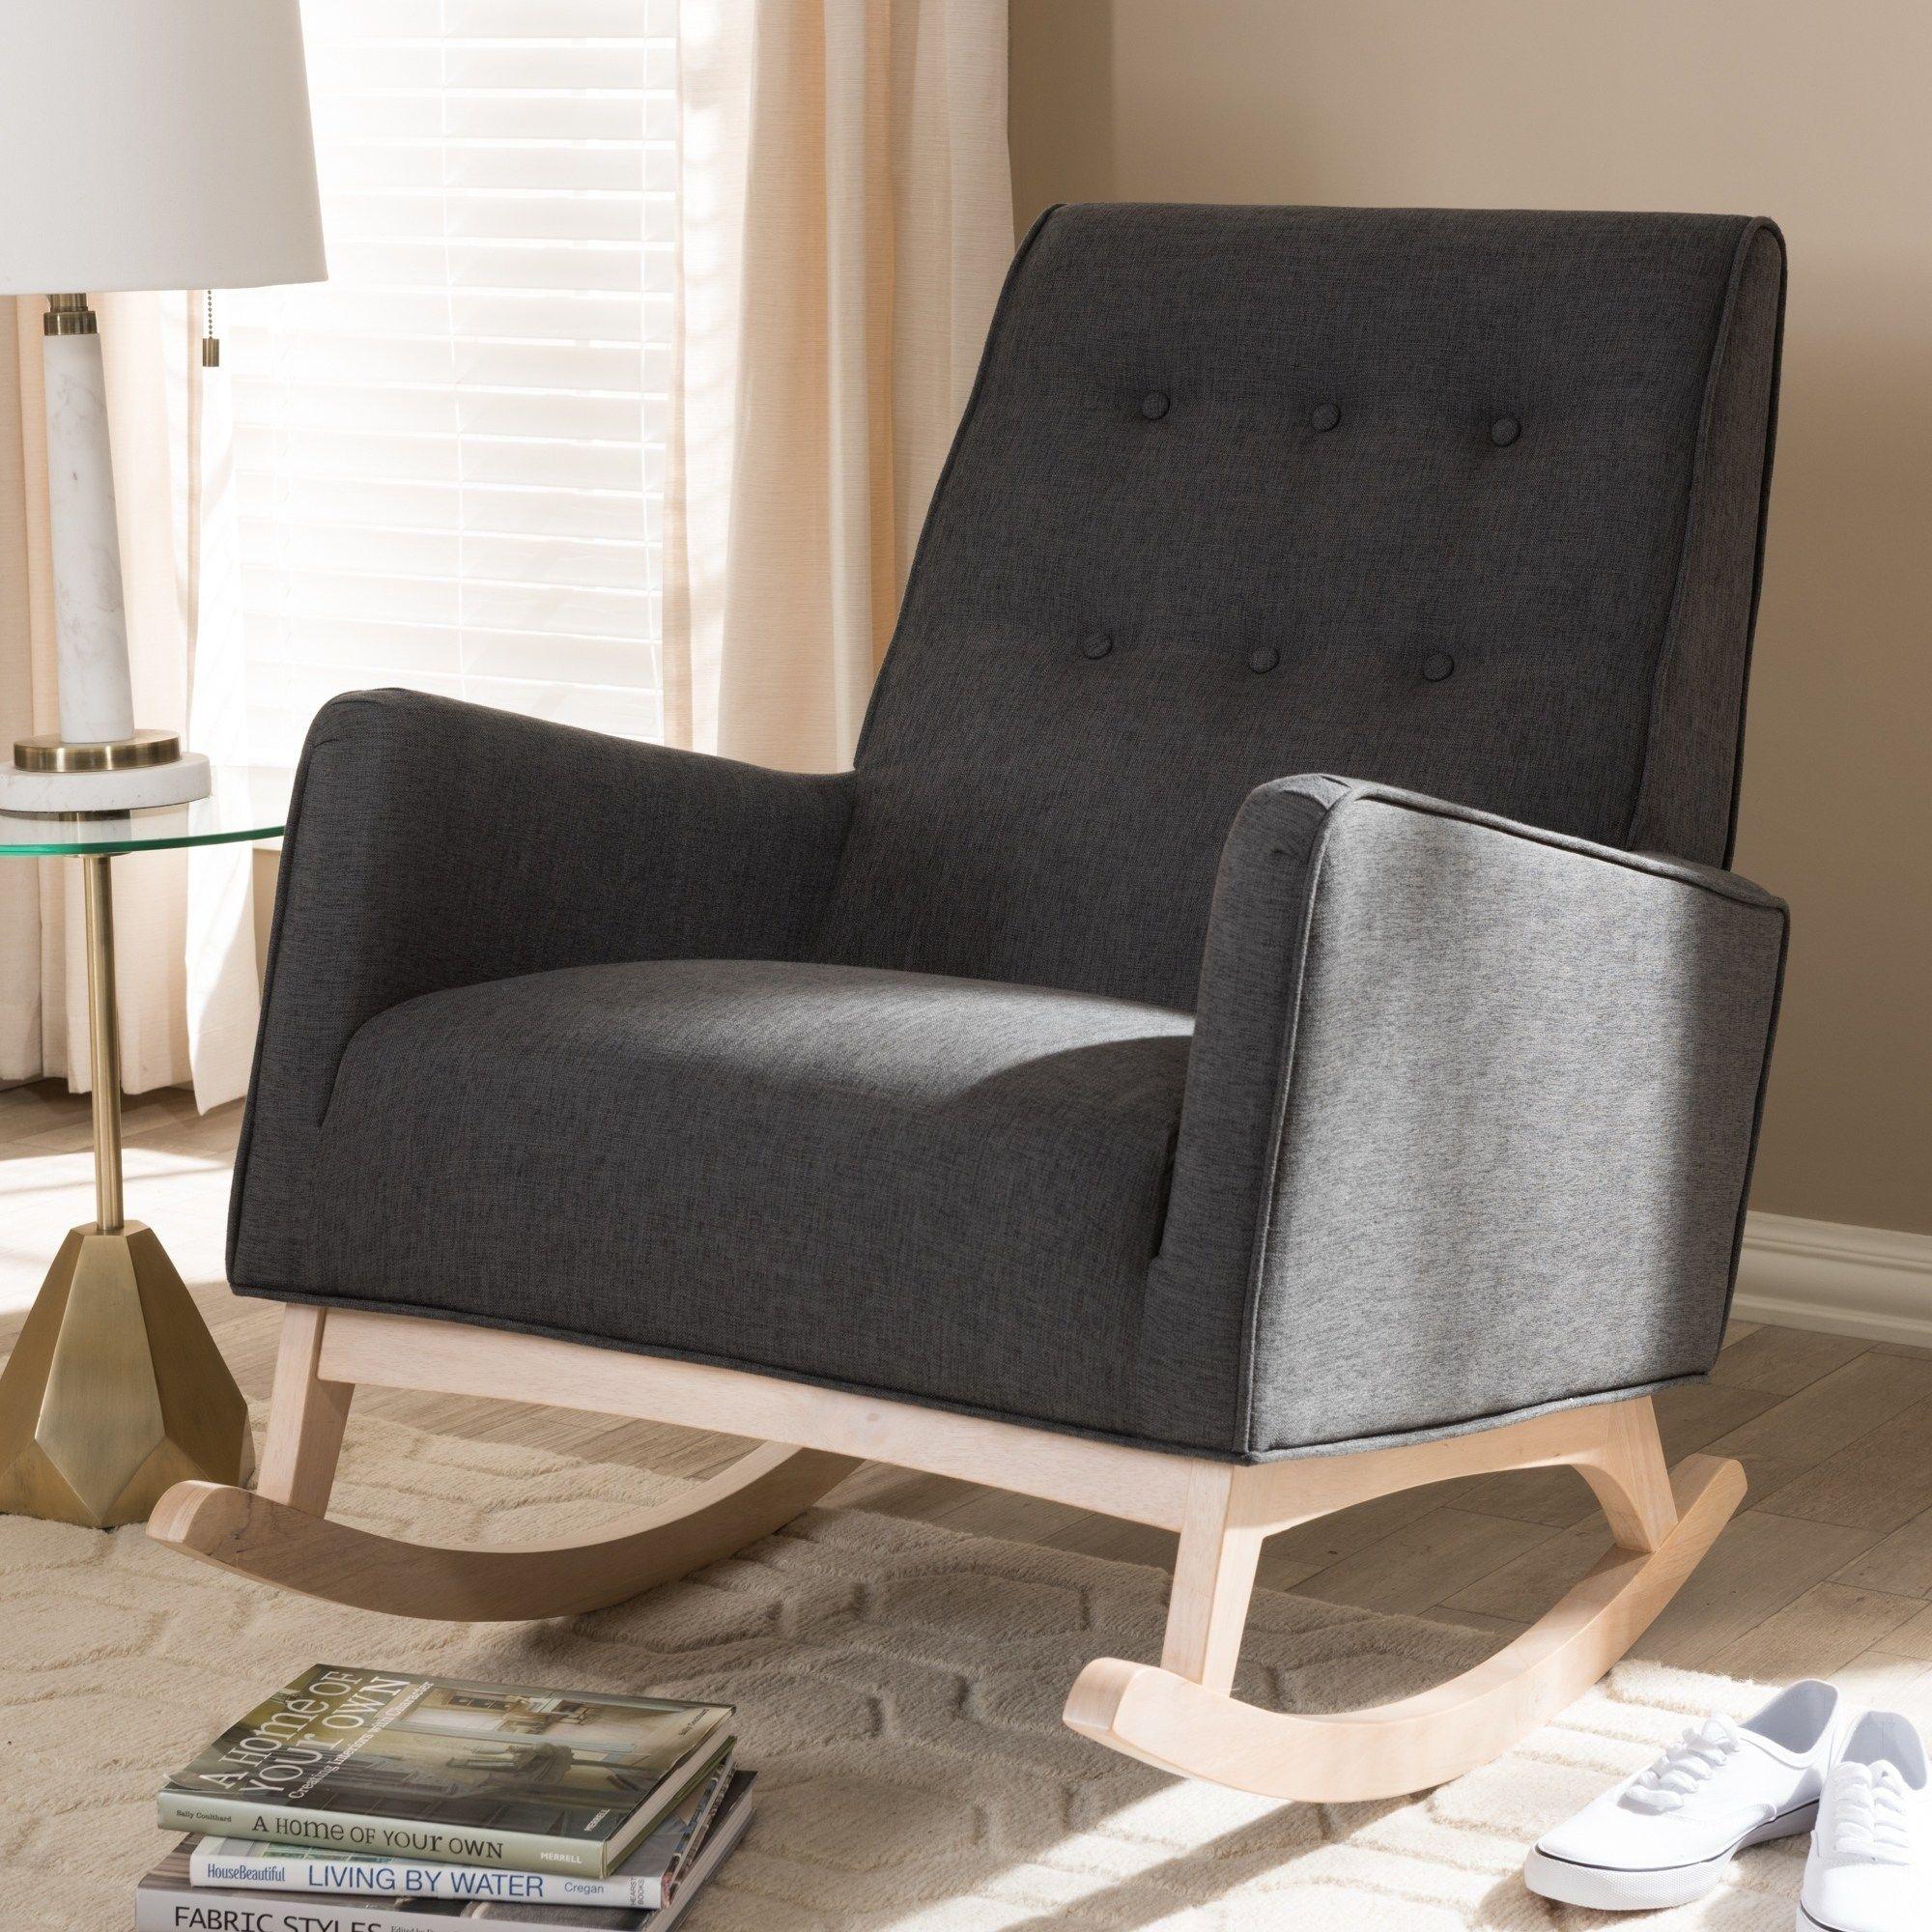 Mid Century Fabric Rocking Chairbaxton Studio (beige Intended For Mid Century Modern Fabric Rocking Chairs (View 20 of 20)